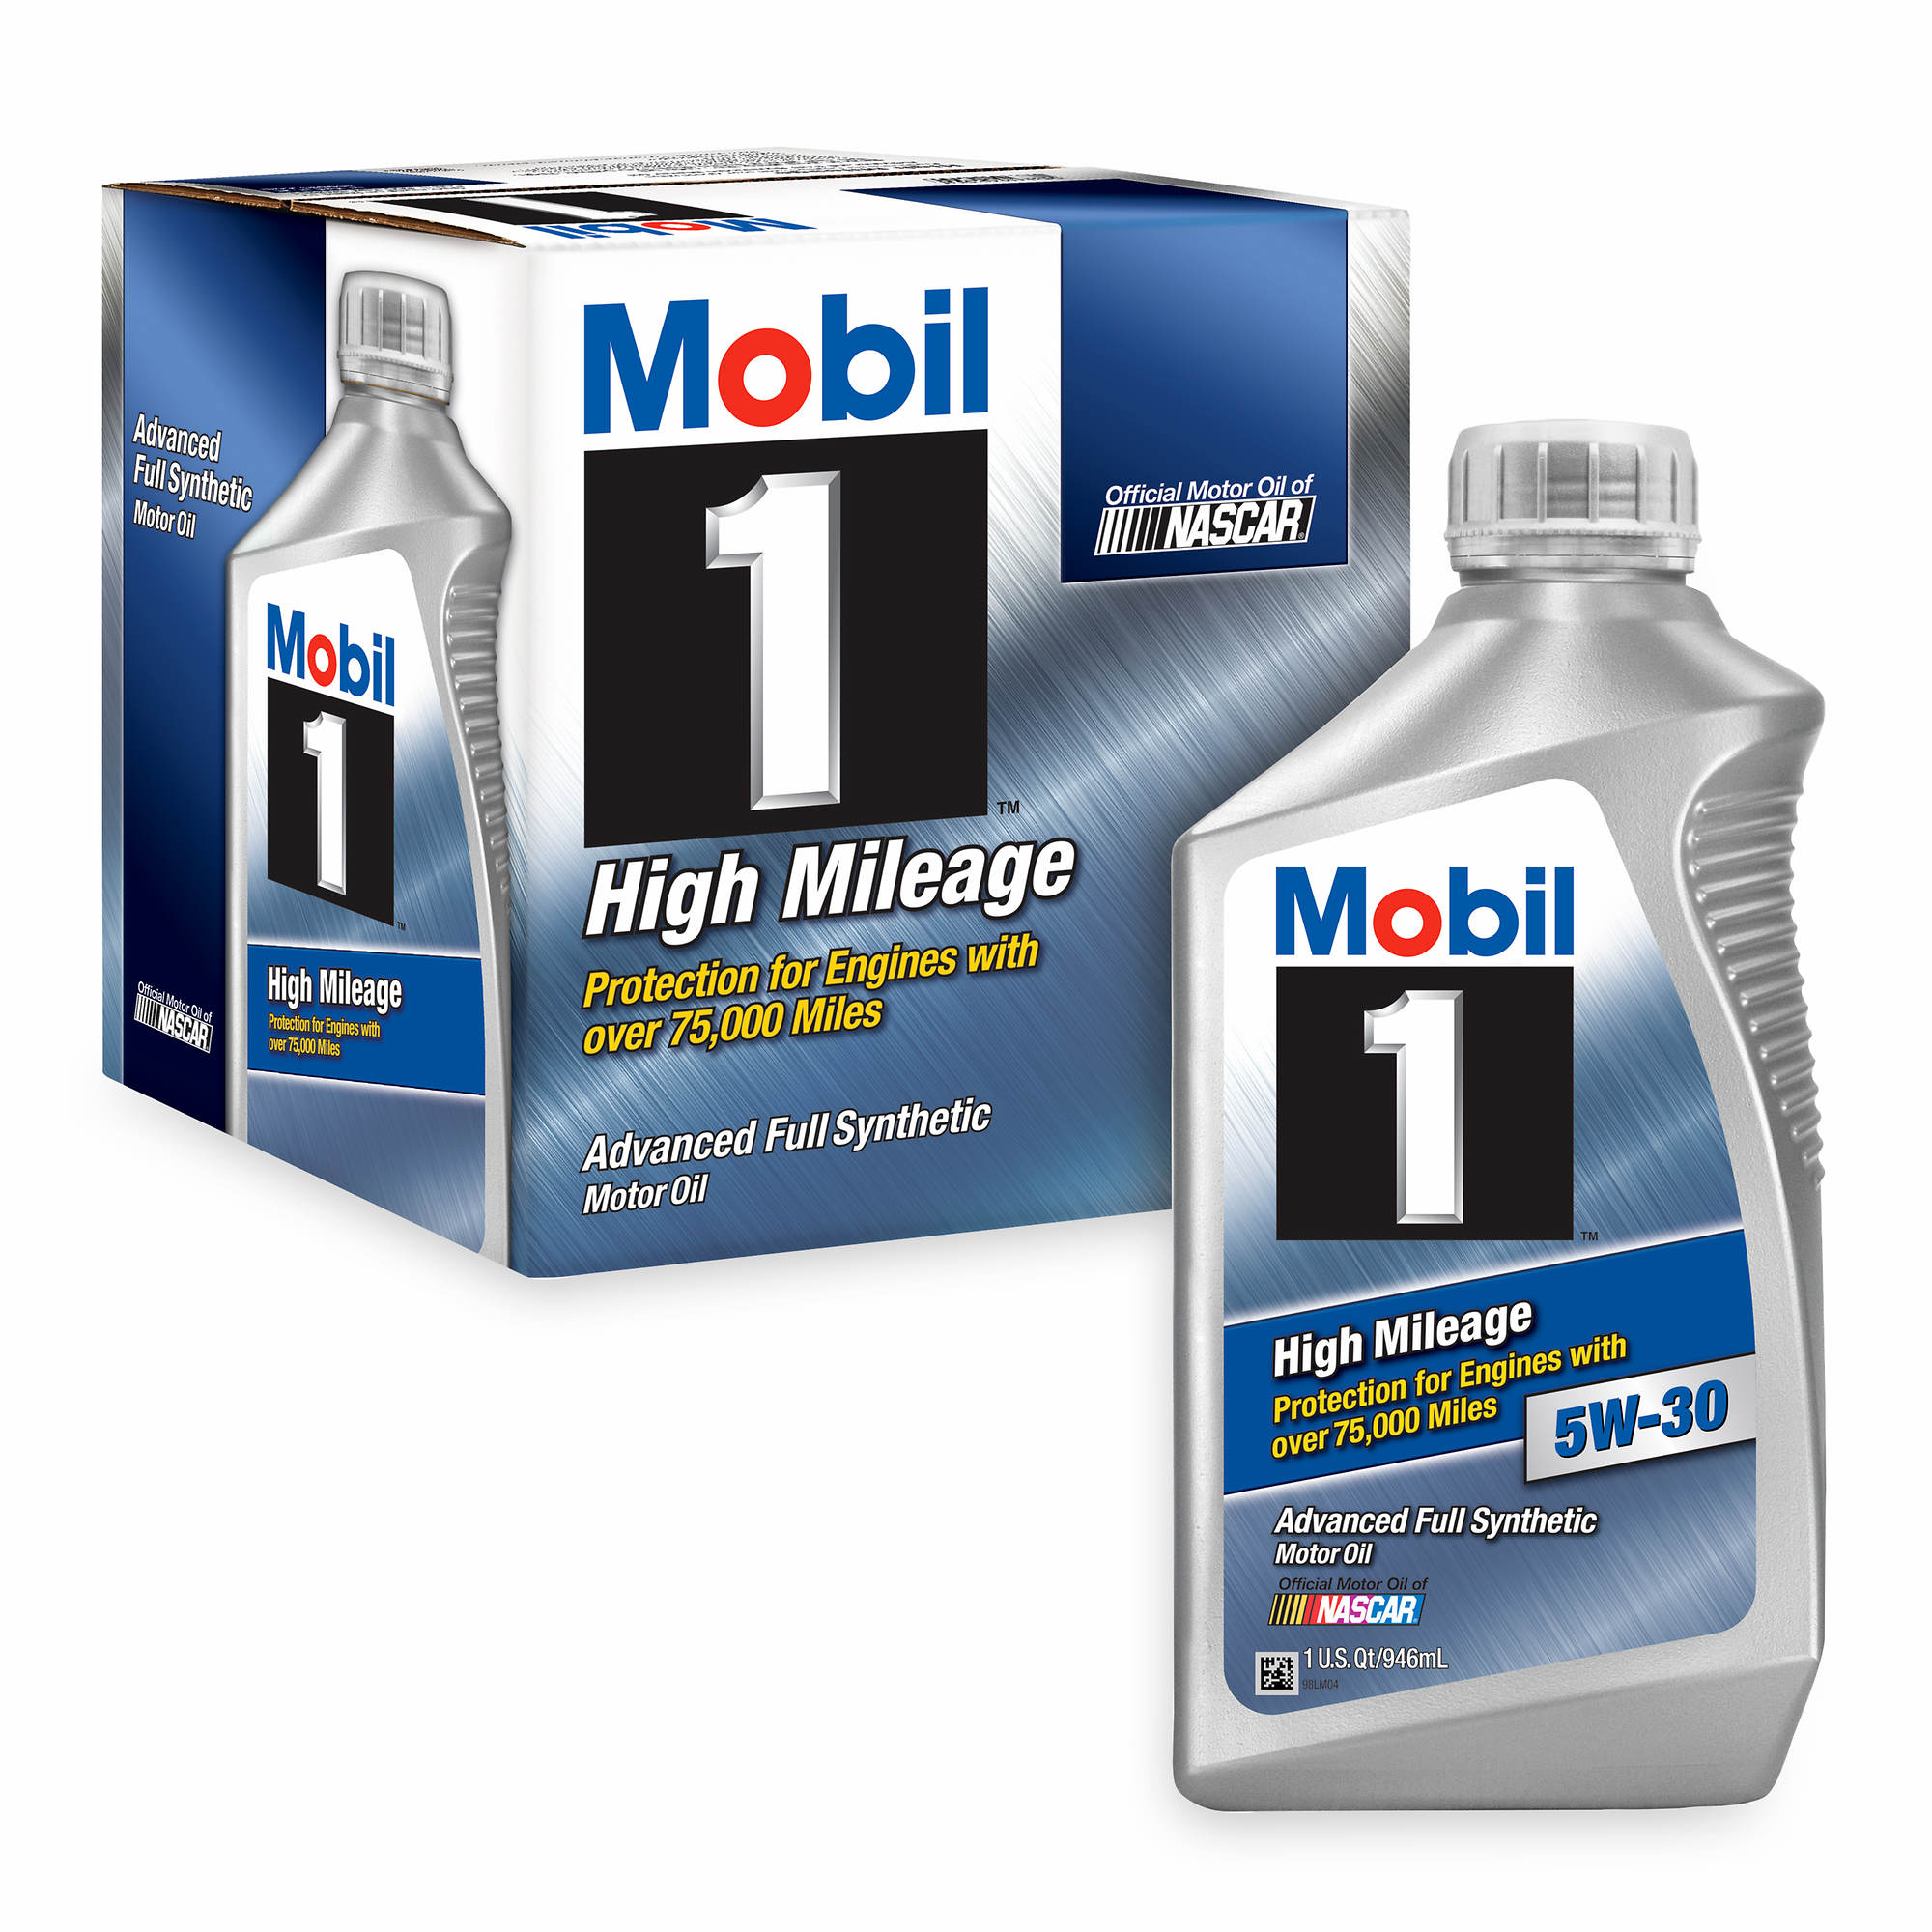 mobil 1 5w 30 high mileage synthetic motor oil 6 pk 1 qt. Black Bedroom Furniture Sets. Home Design Ideas